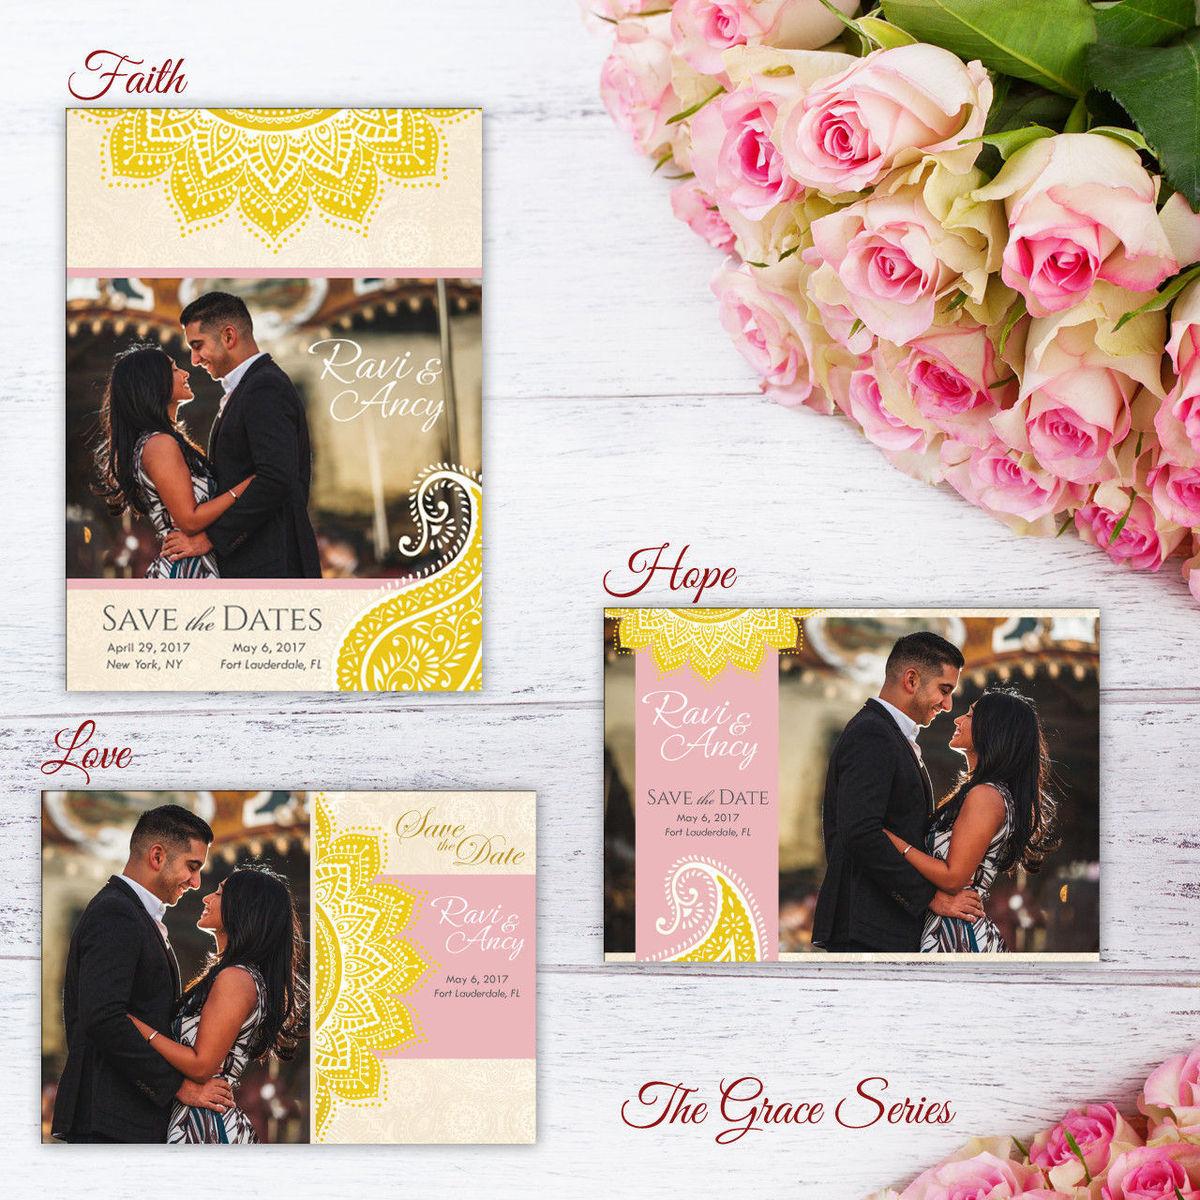 Mycolorshop Invitations Jacksonville Fl Weddingwire